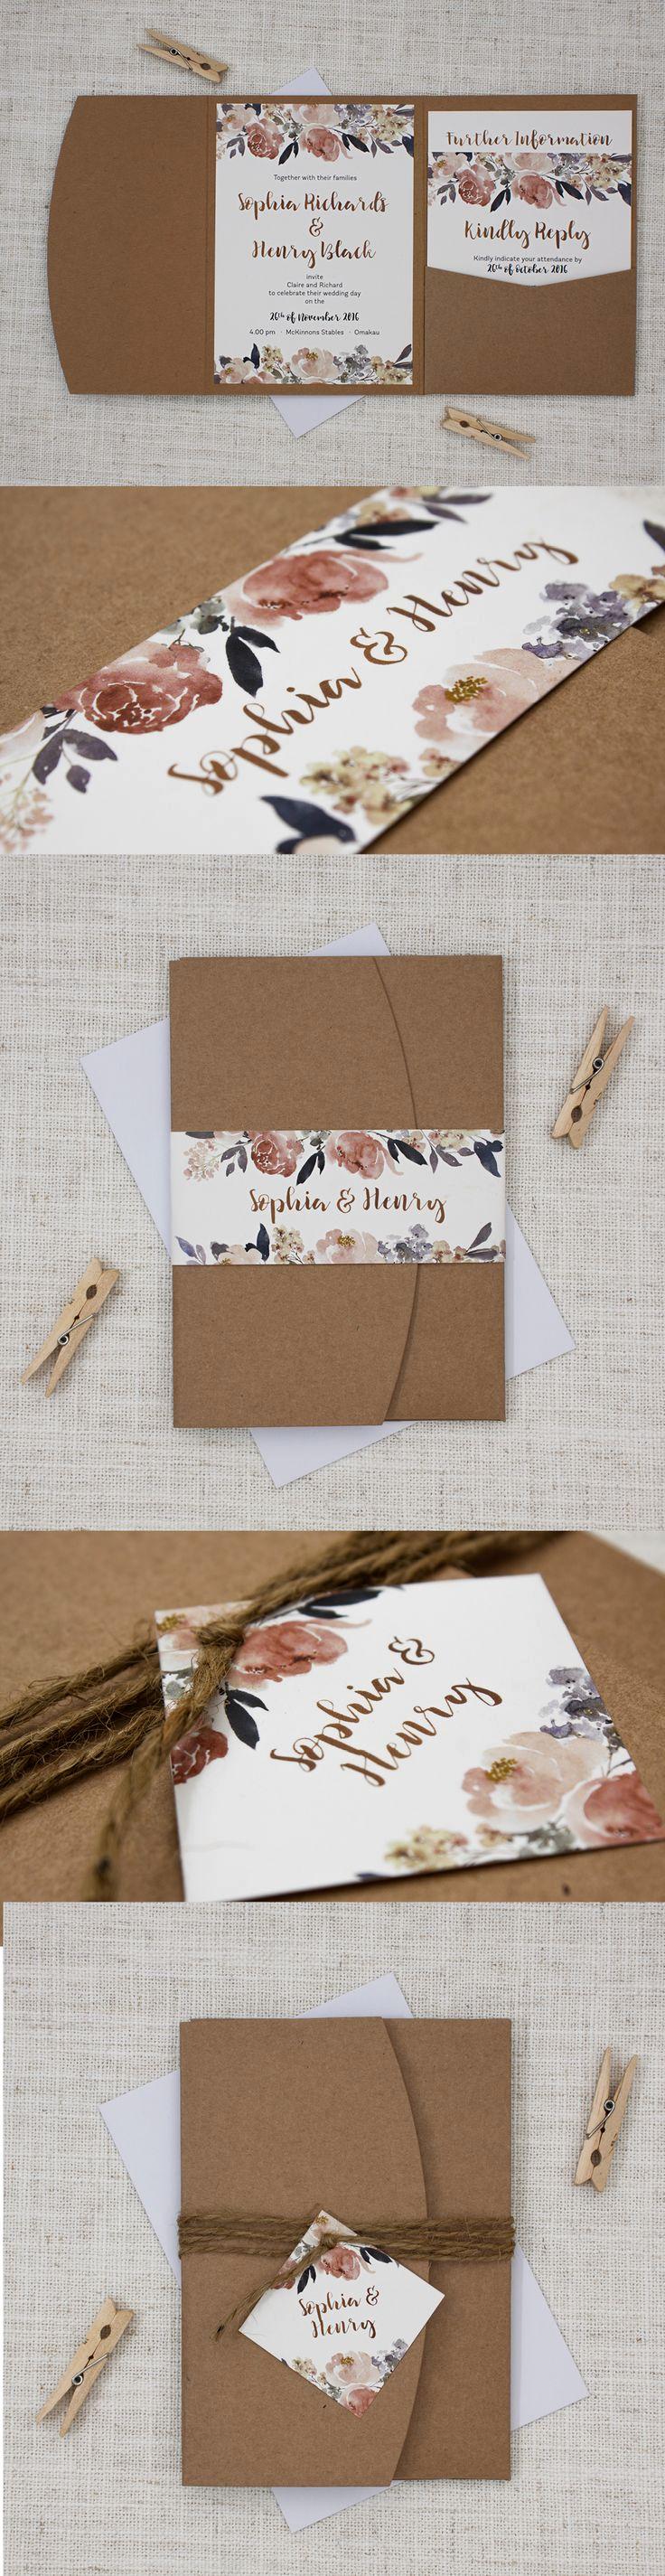 Wedding Invitation Design Ideas Elegant Best 25 Wedding Invitations Ideas On Pinterest